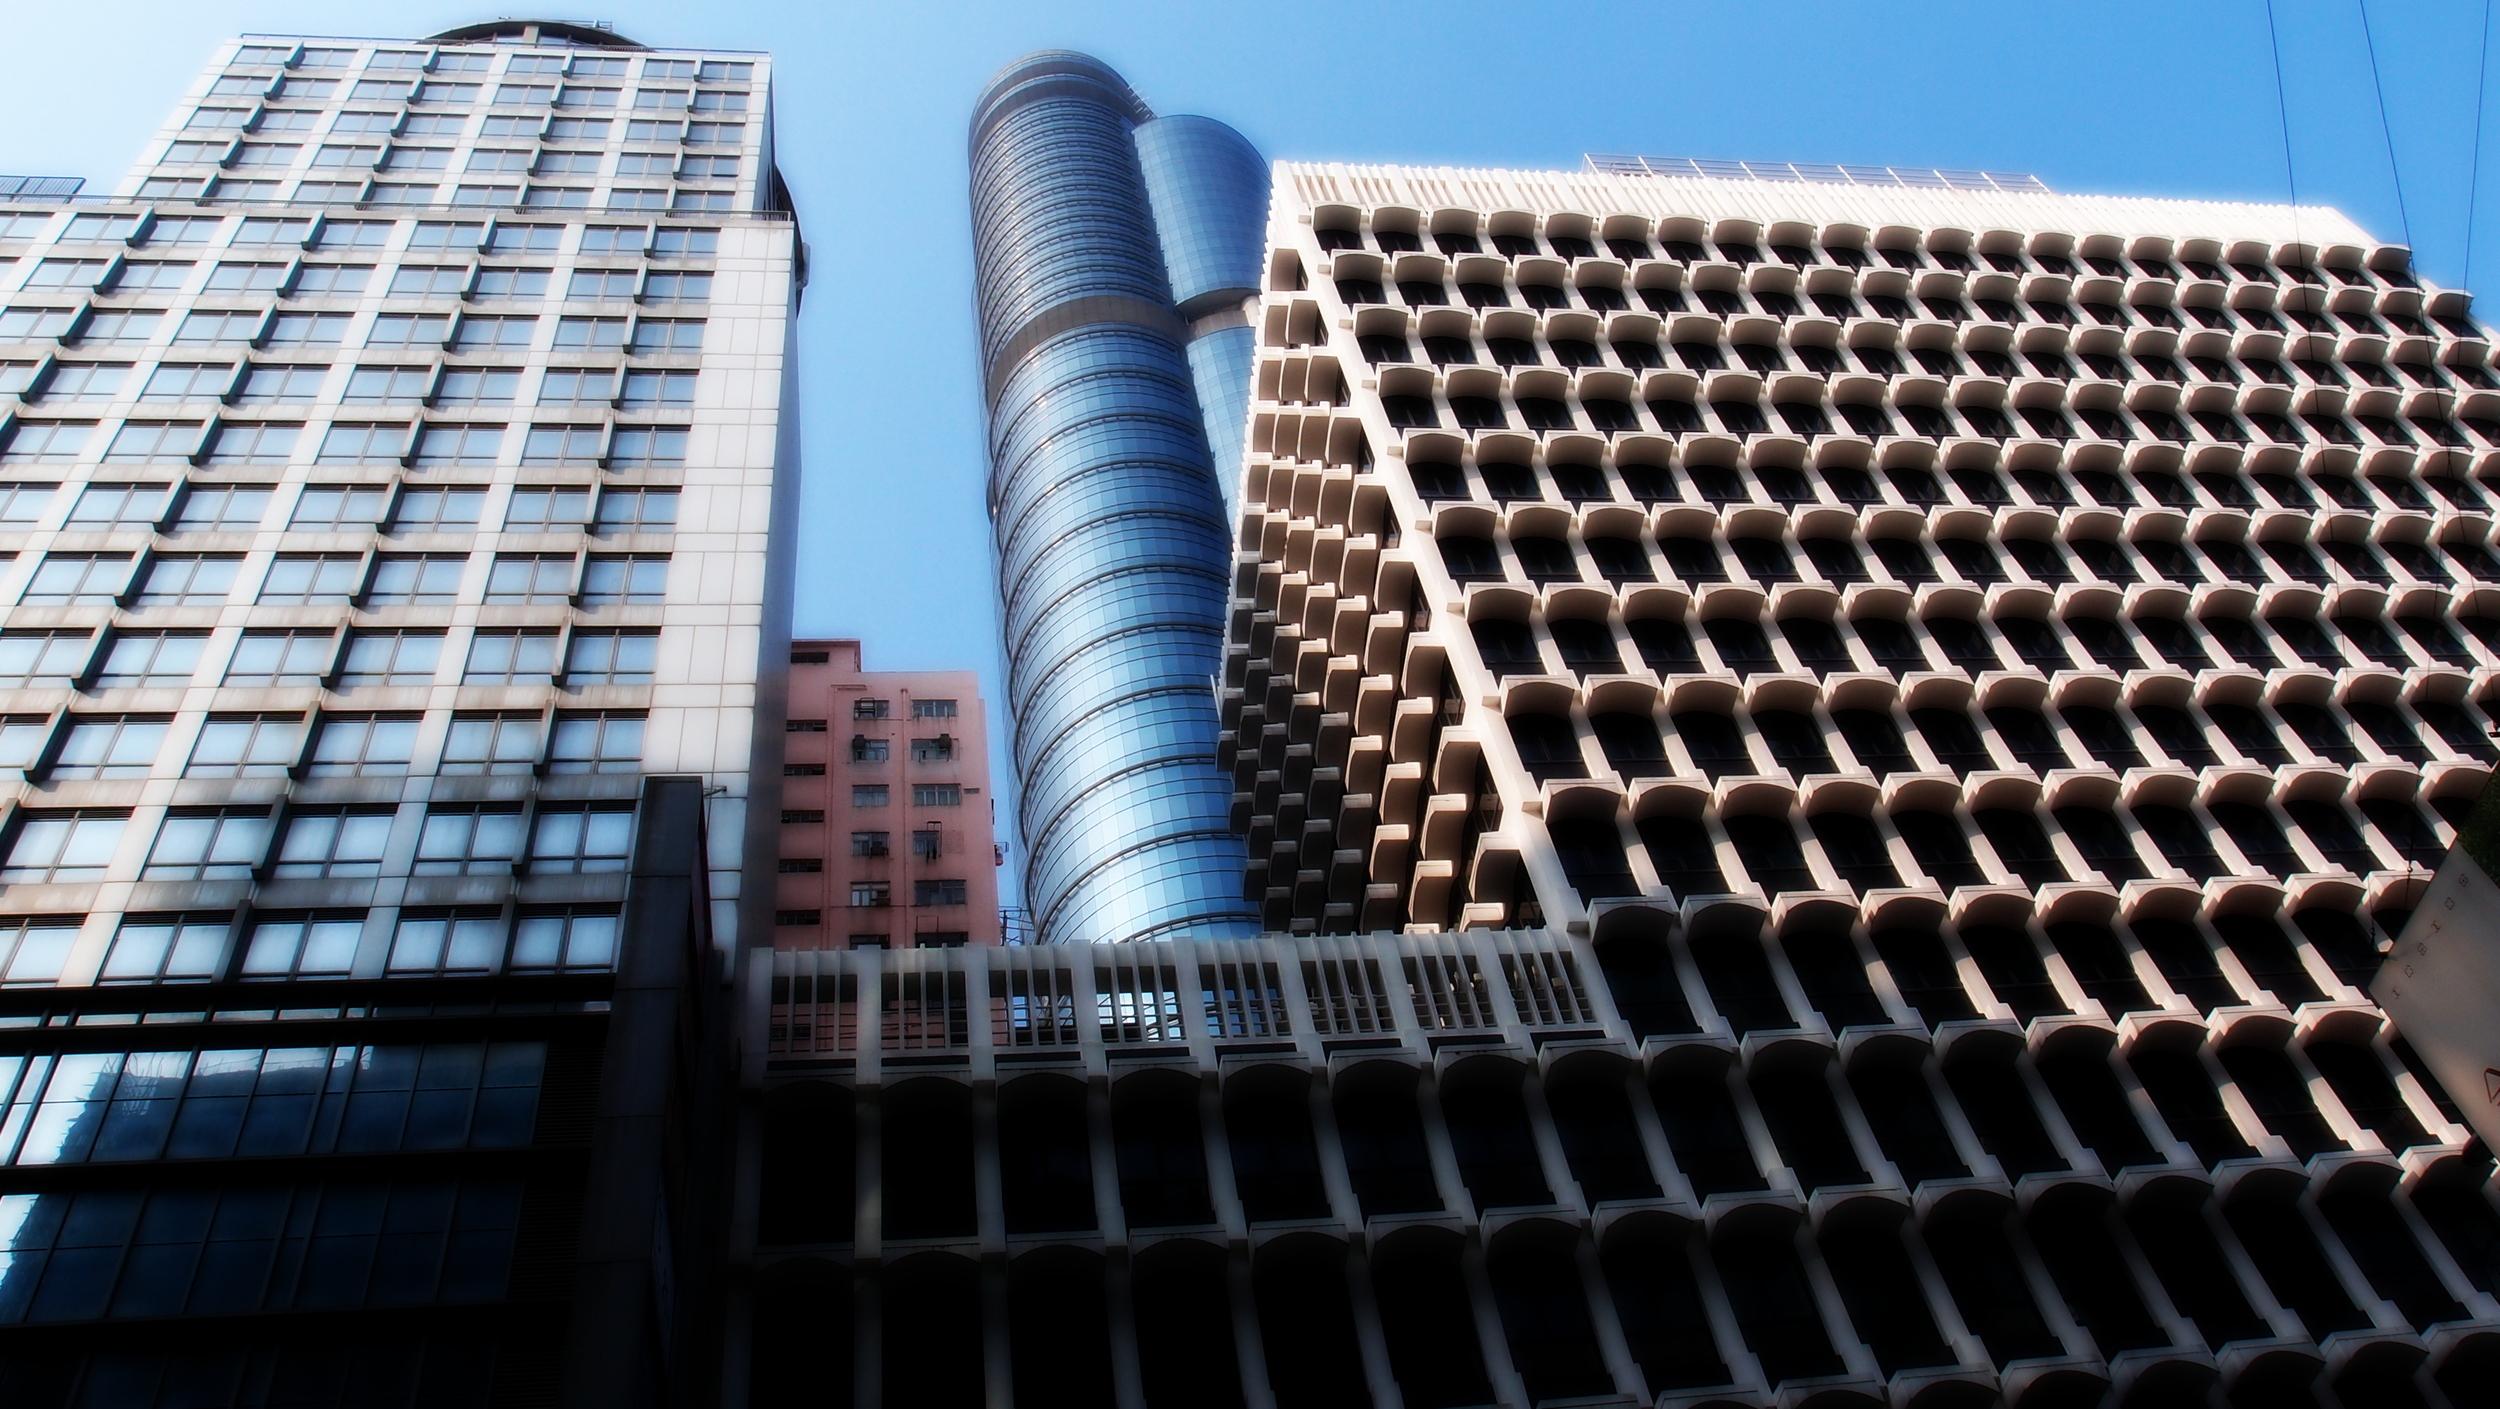 Contrasting buildings in Mongkok in Kowloon